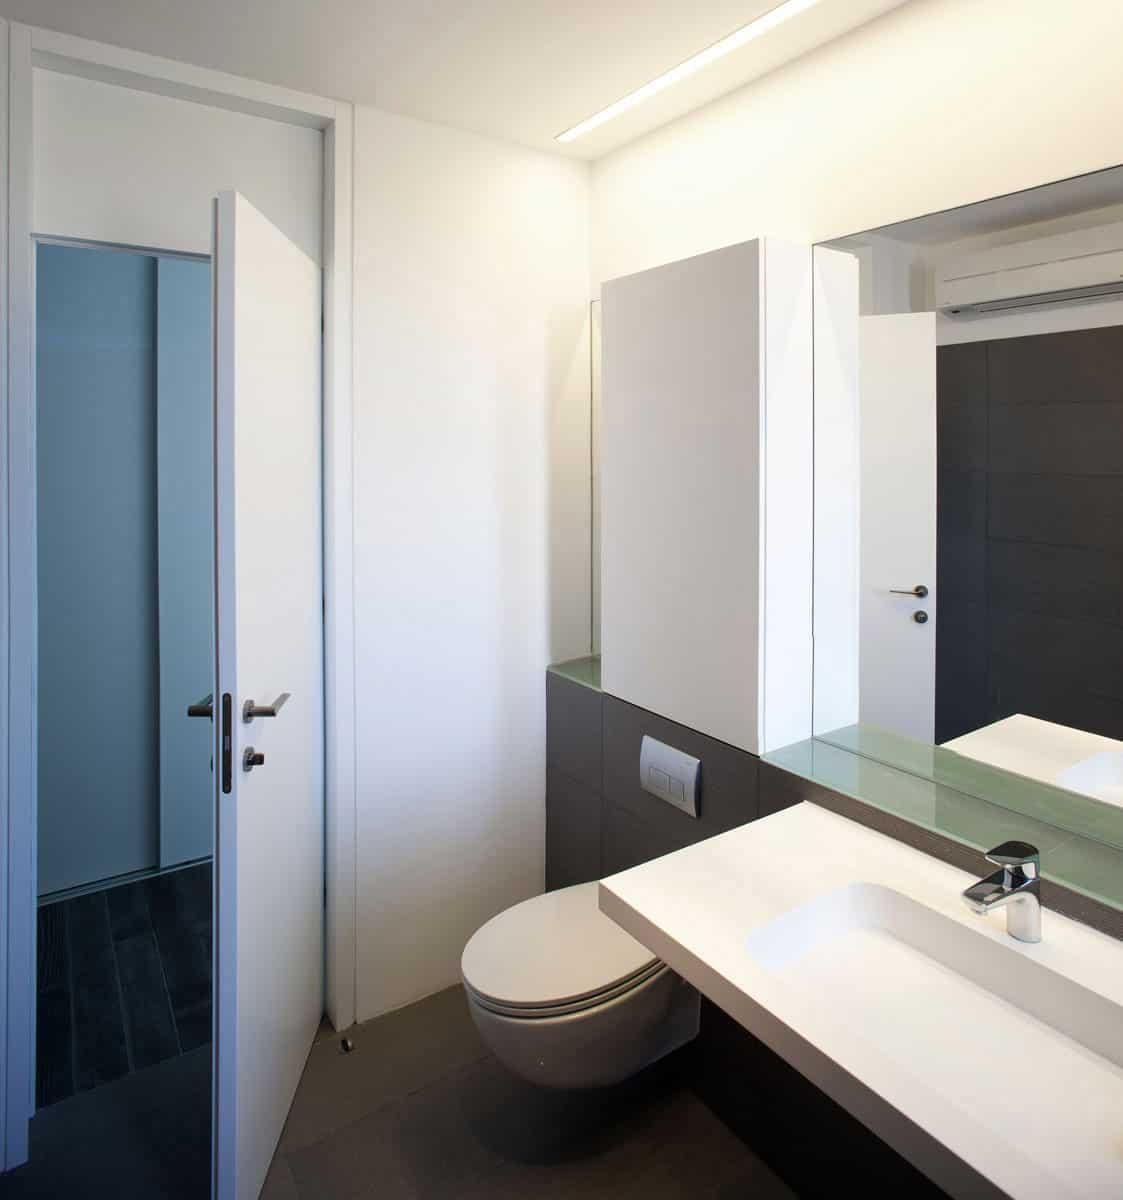 bathroom design software - HD1123×1200